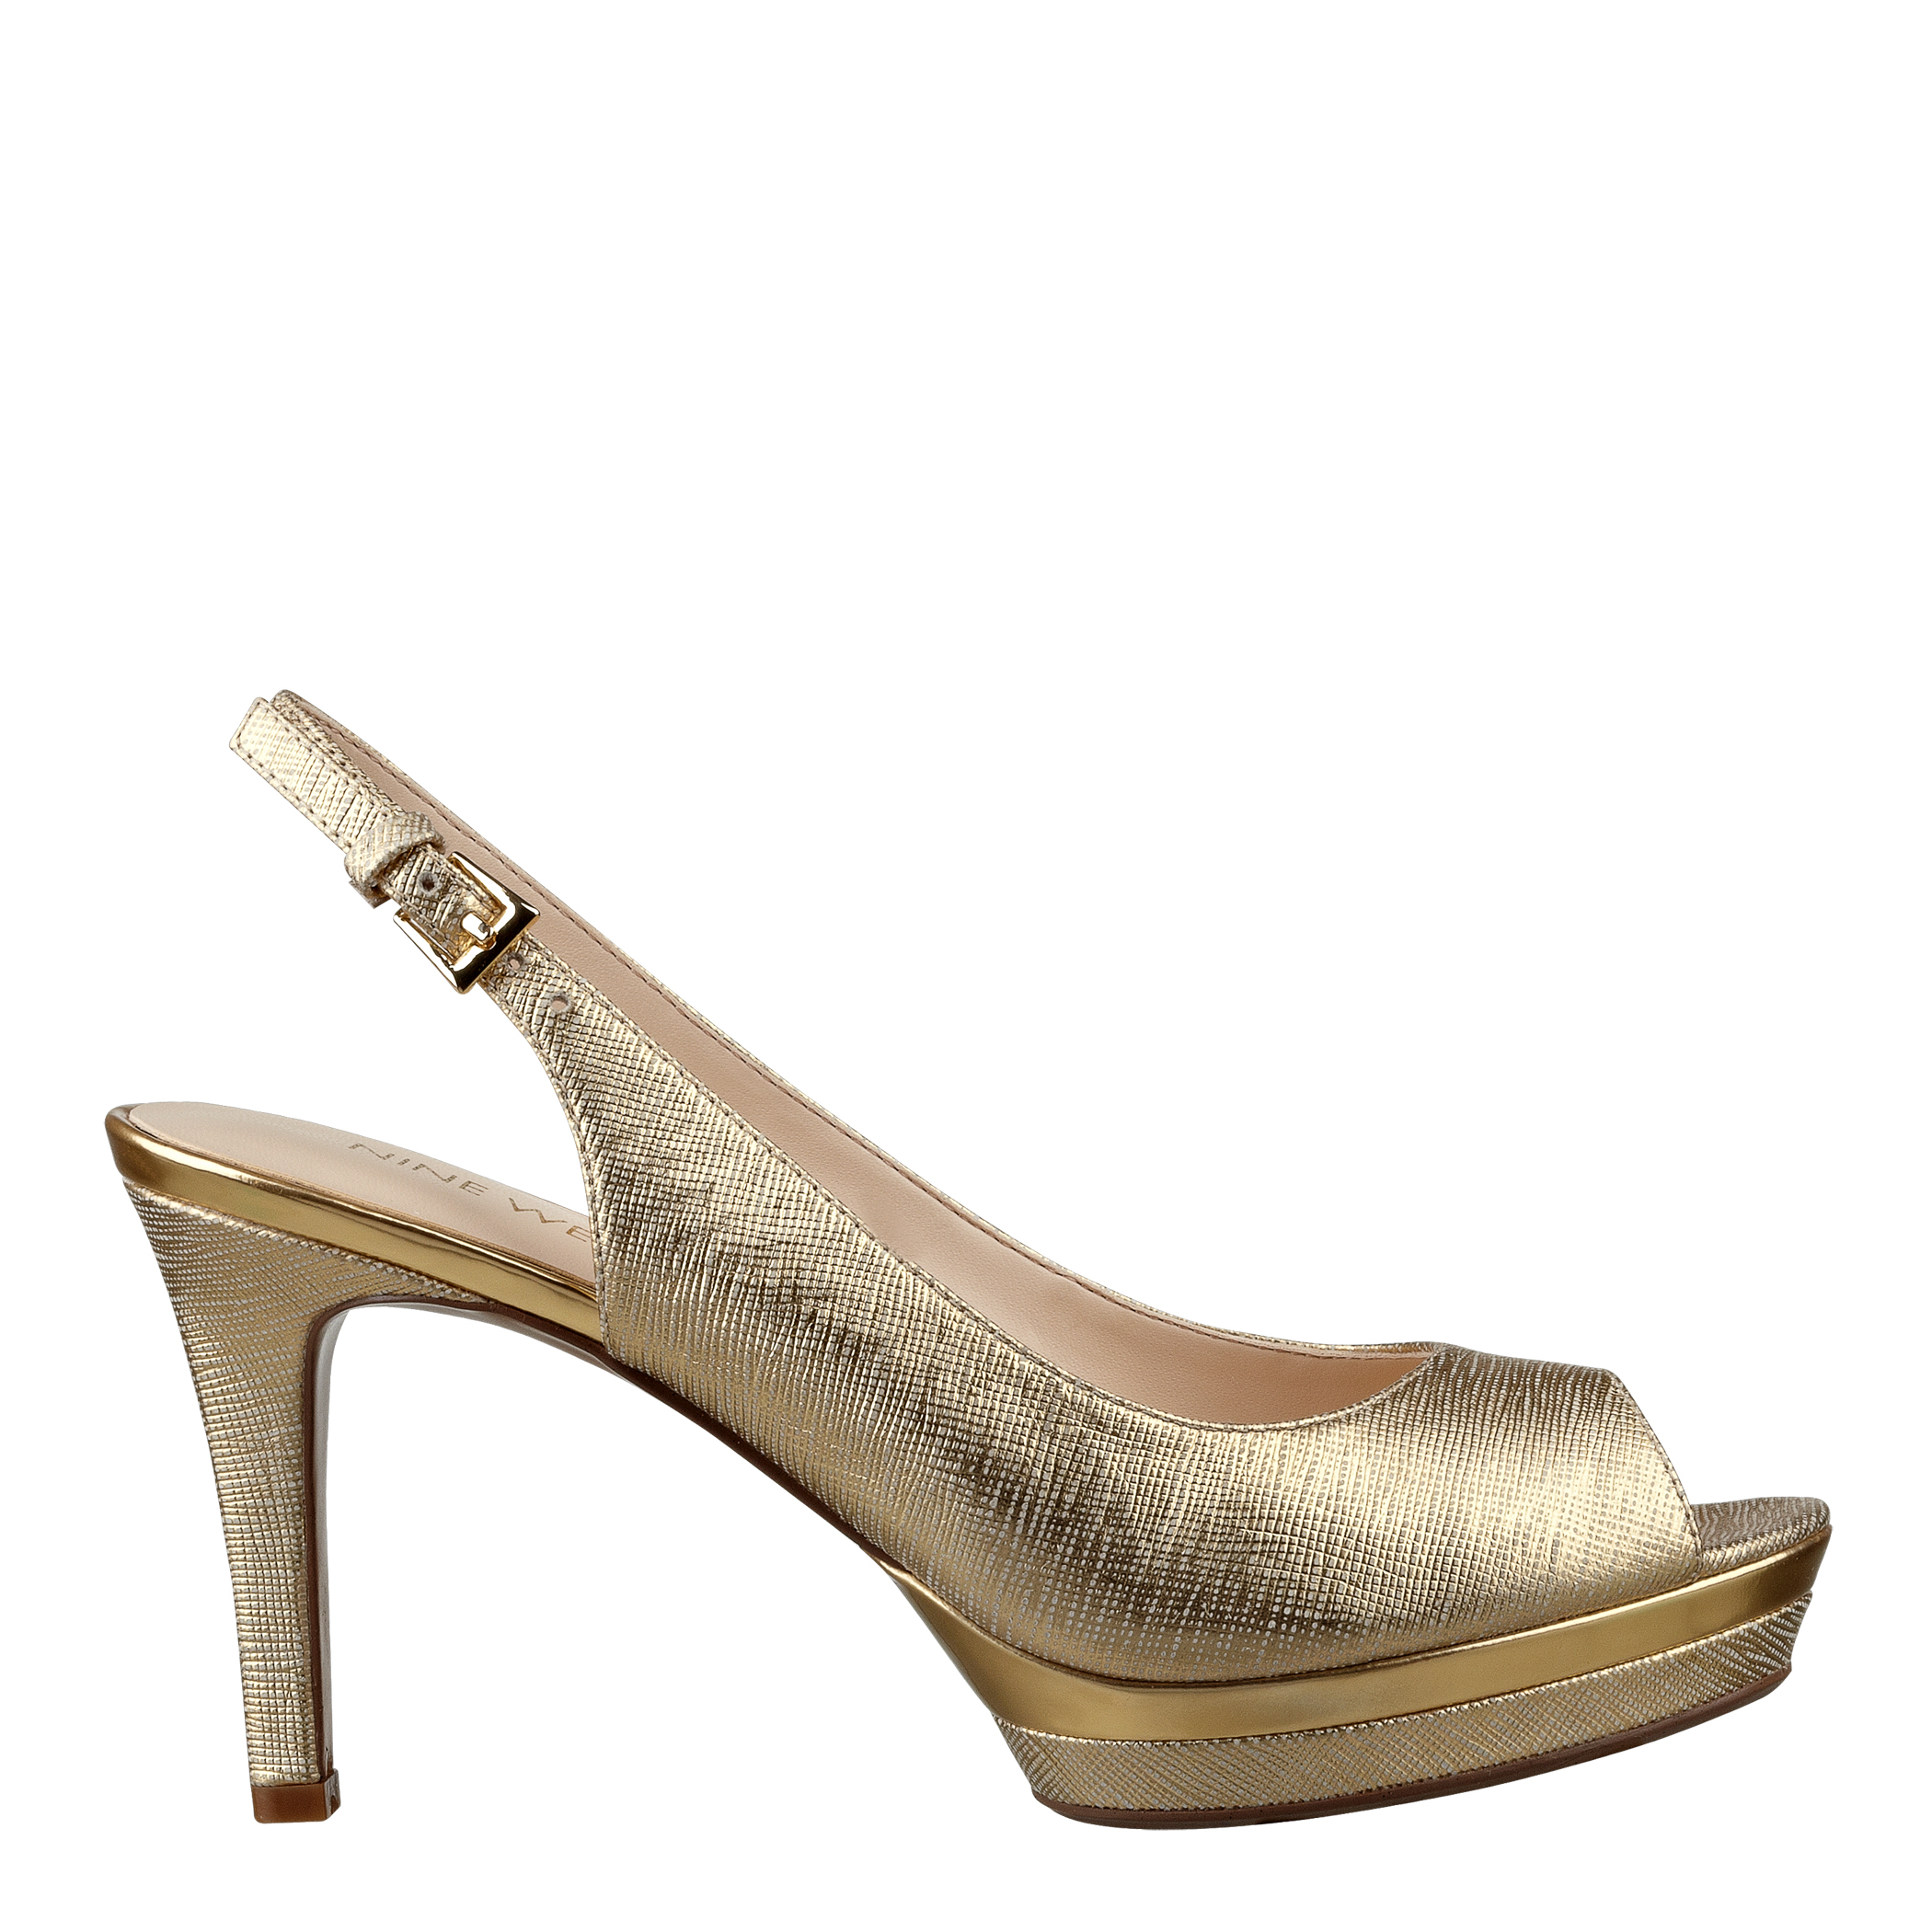 Nine West Gold Peep Toe Shoes